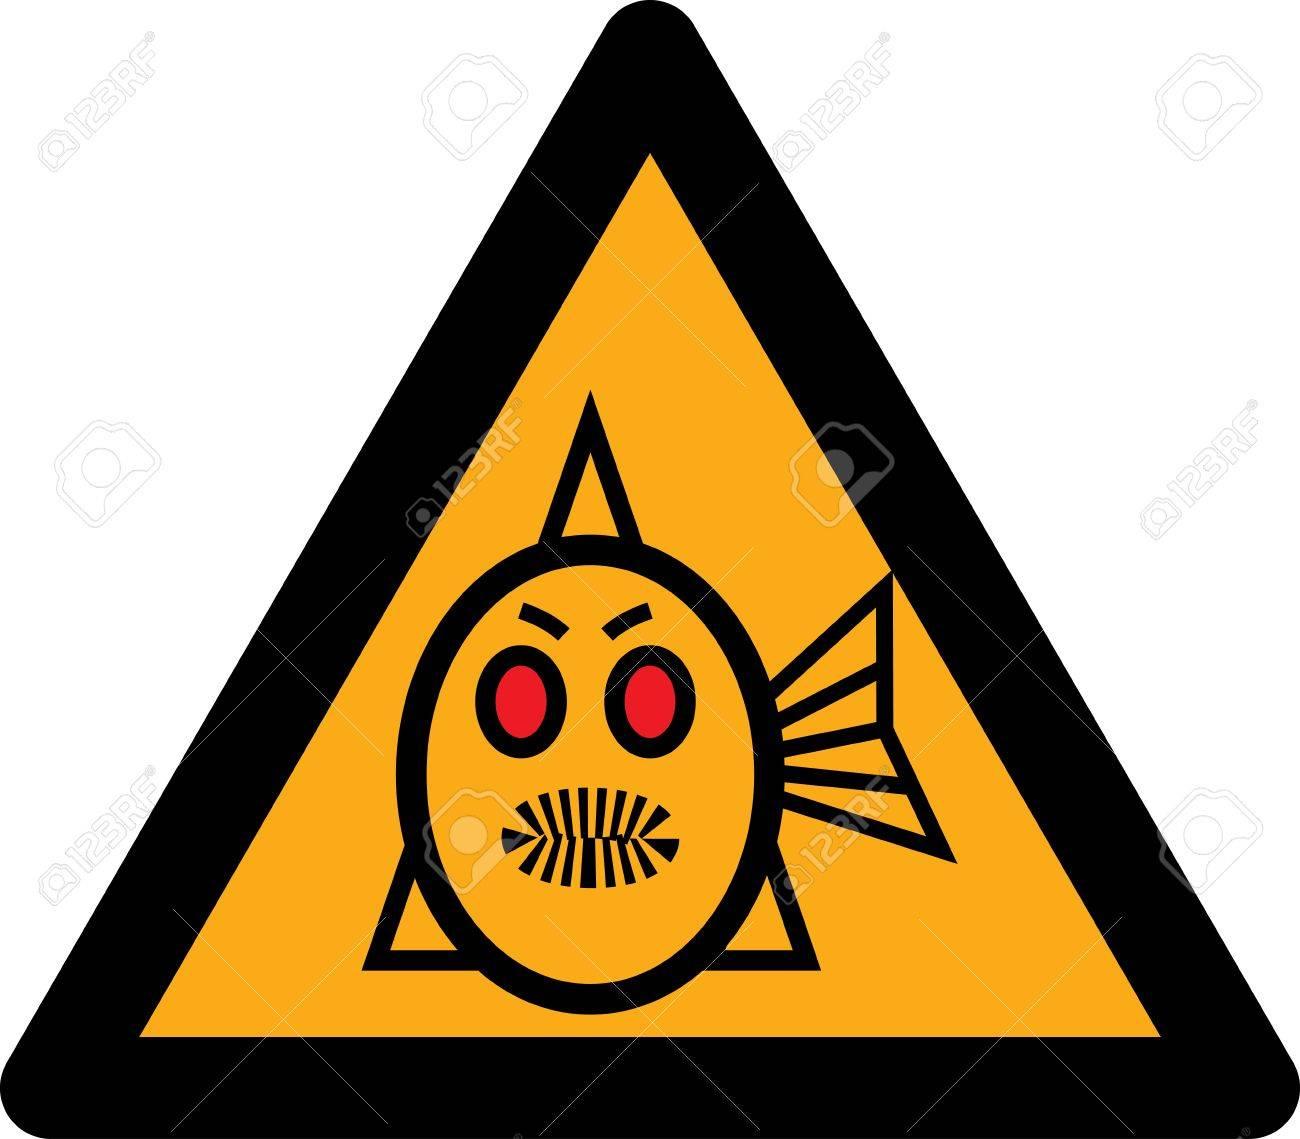 figure piranhas signifying danger Stock Vector - 14926636